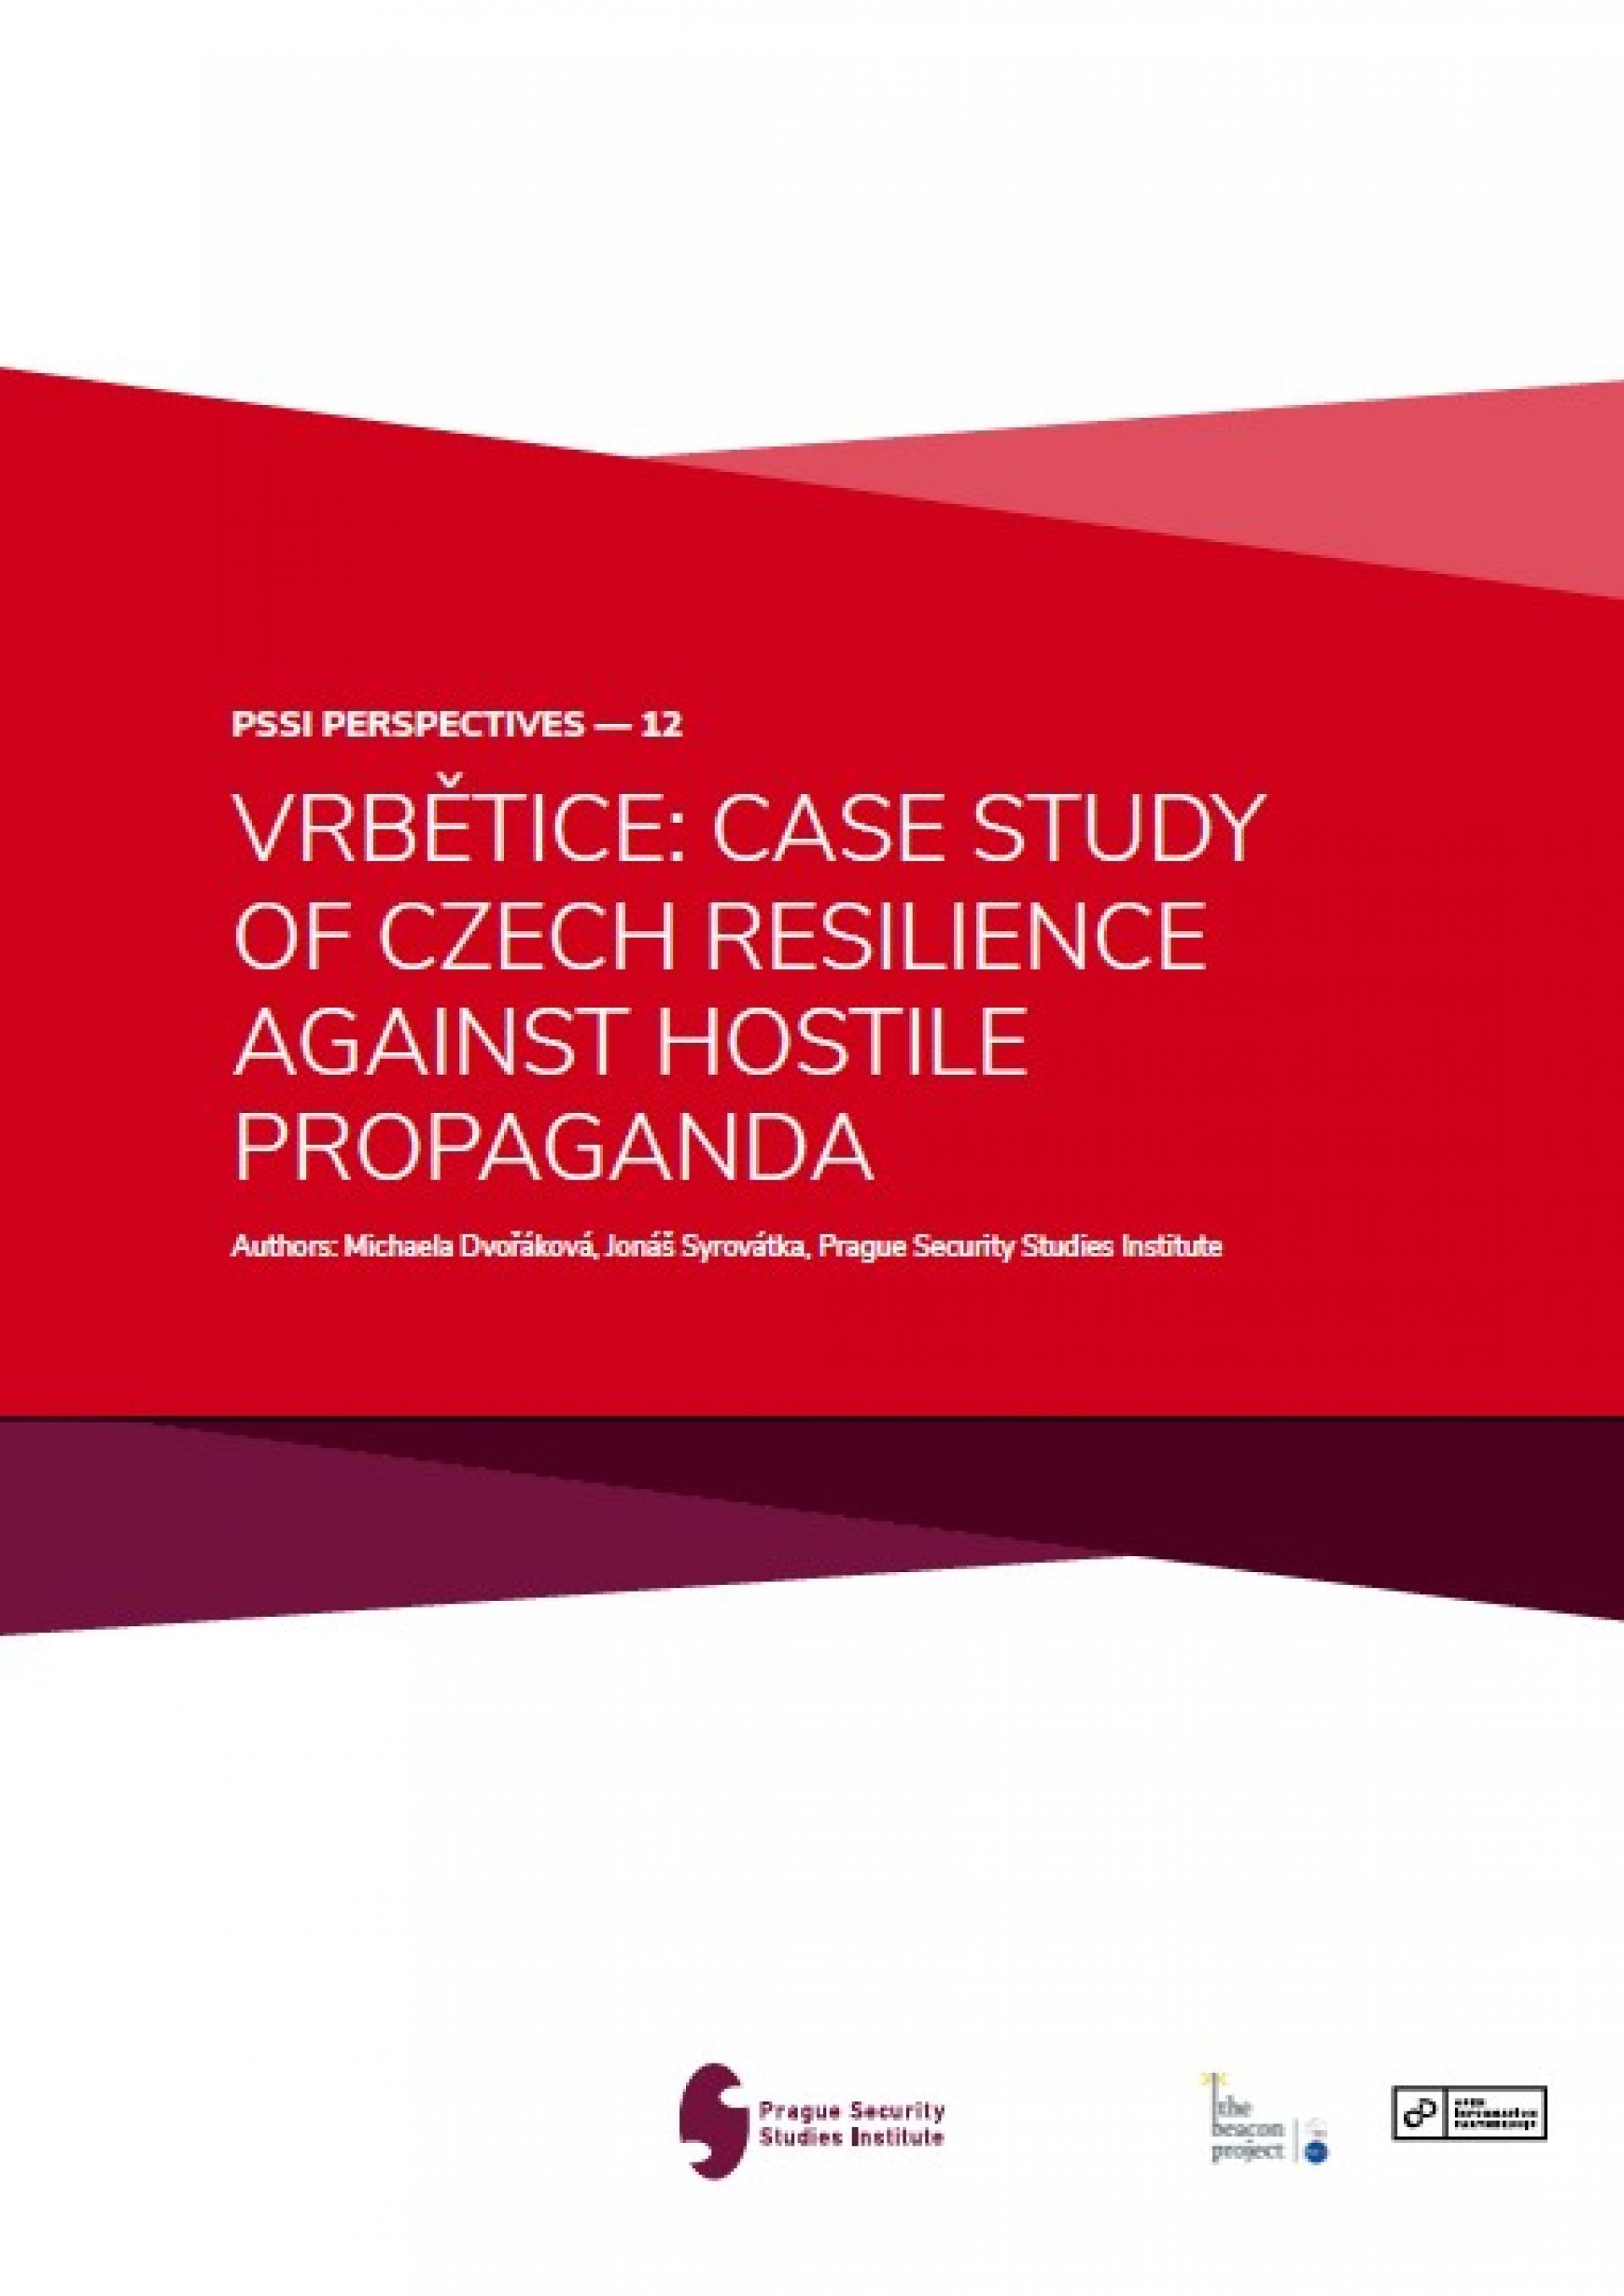 Vrbětice Case Study of Czech Resilience Against Hostile Propaganda COVERPHOTO